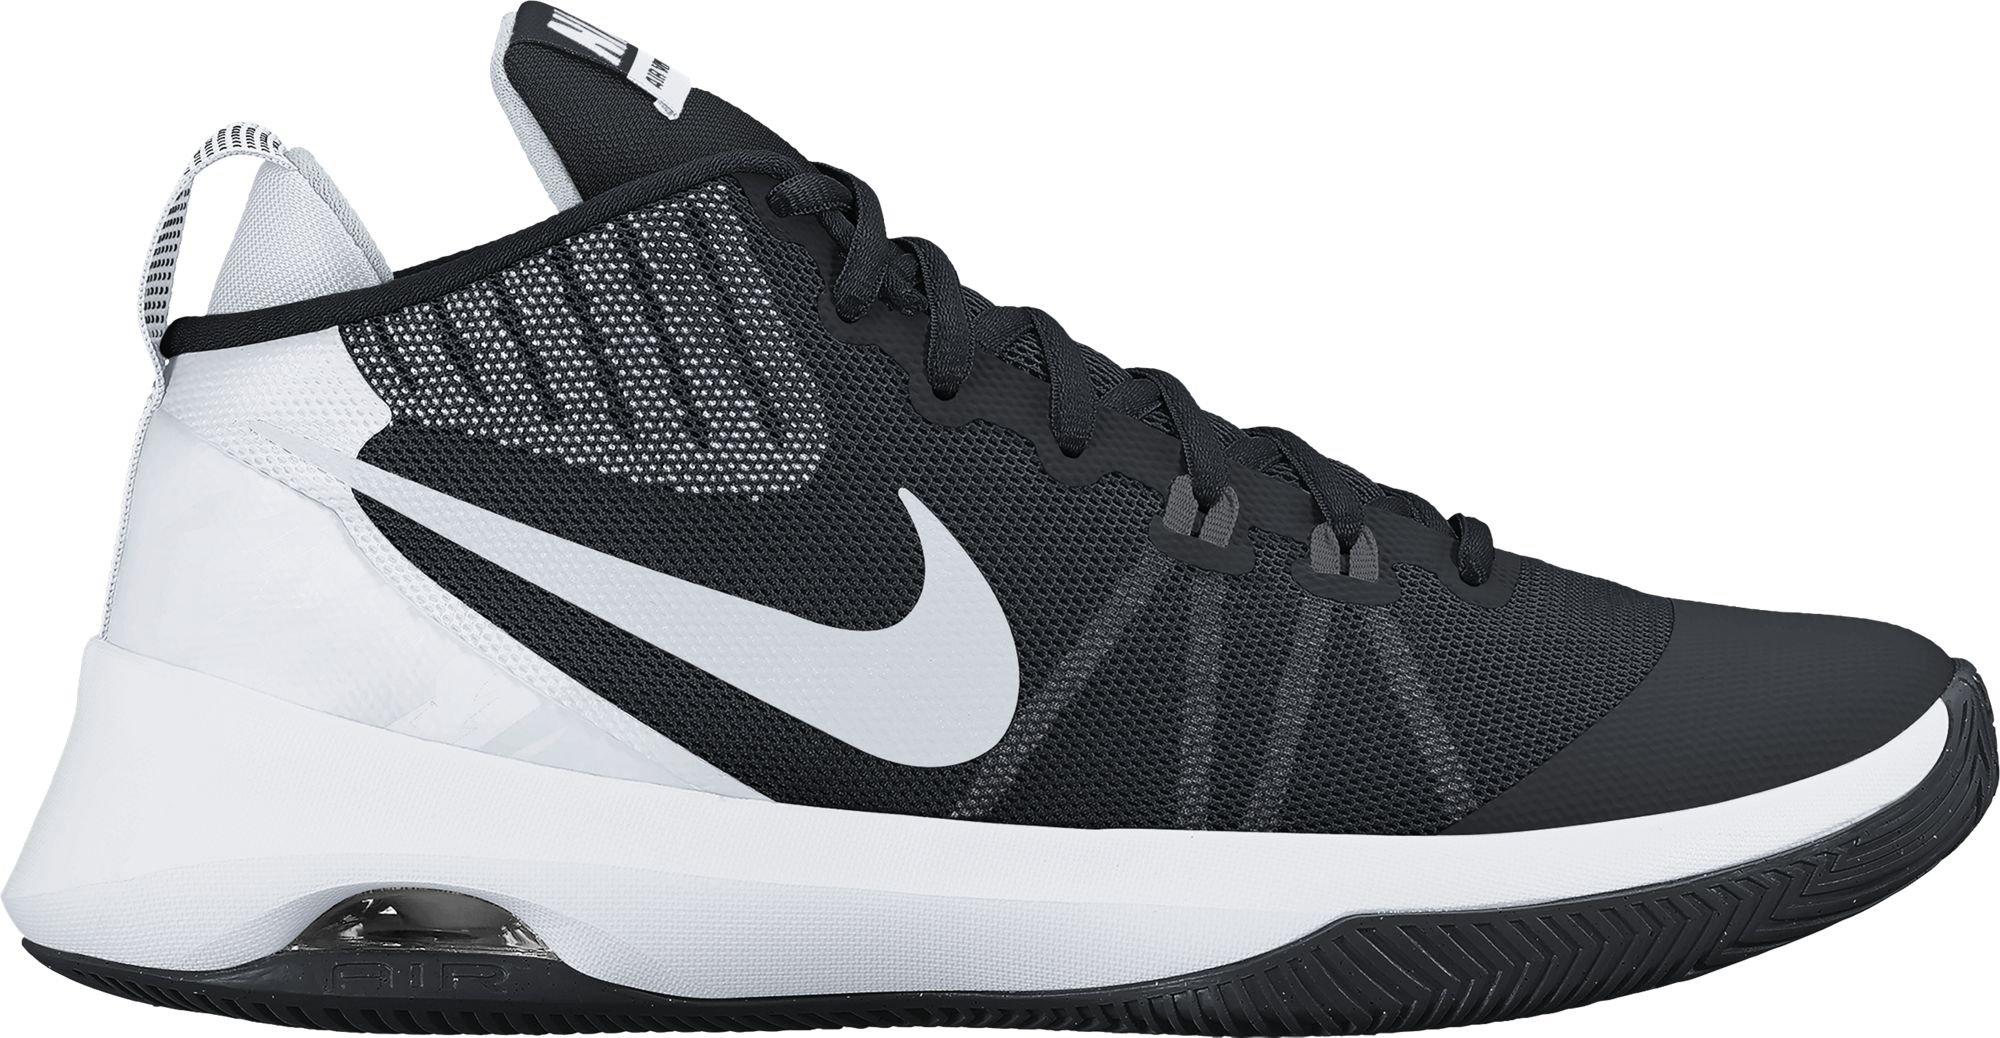 NIKE Mens Air Versitile Nbk Basketball-Shoes (10, Black/Metallic Silver/Dark Grey)